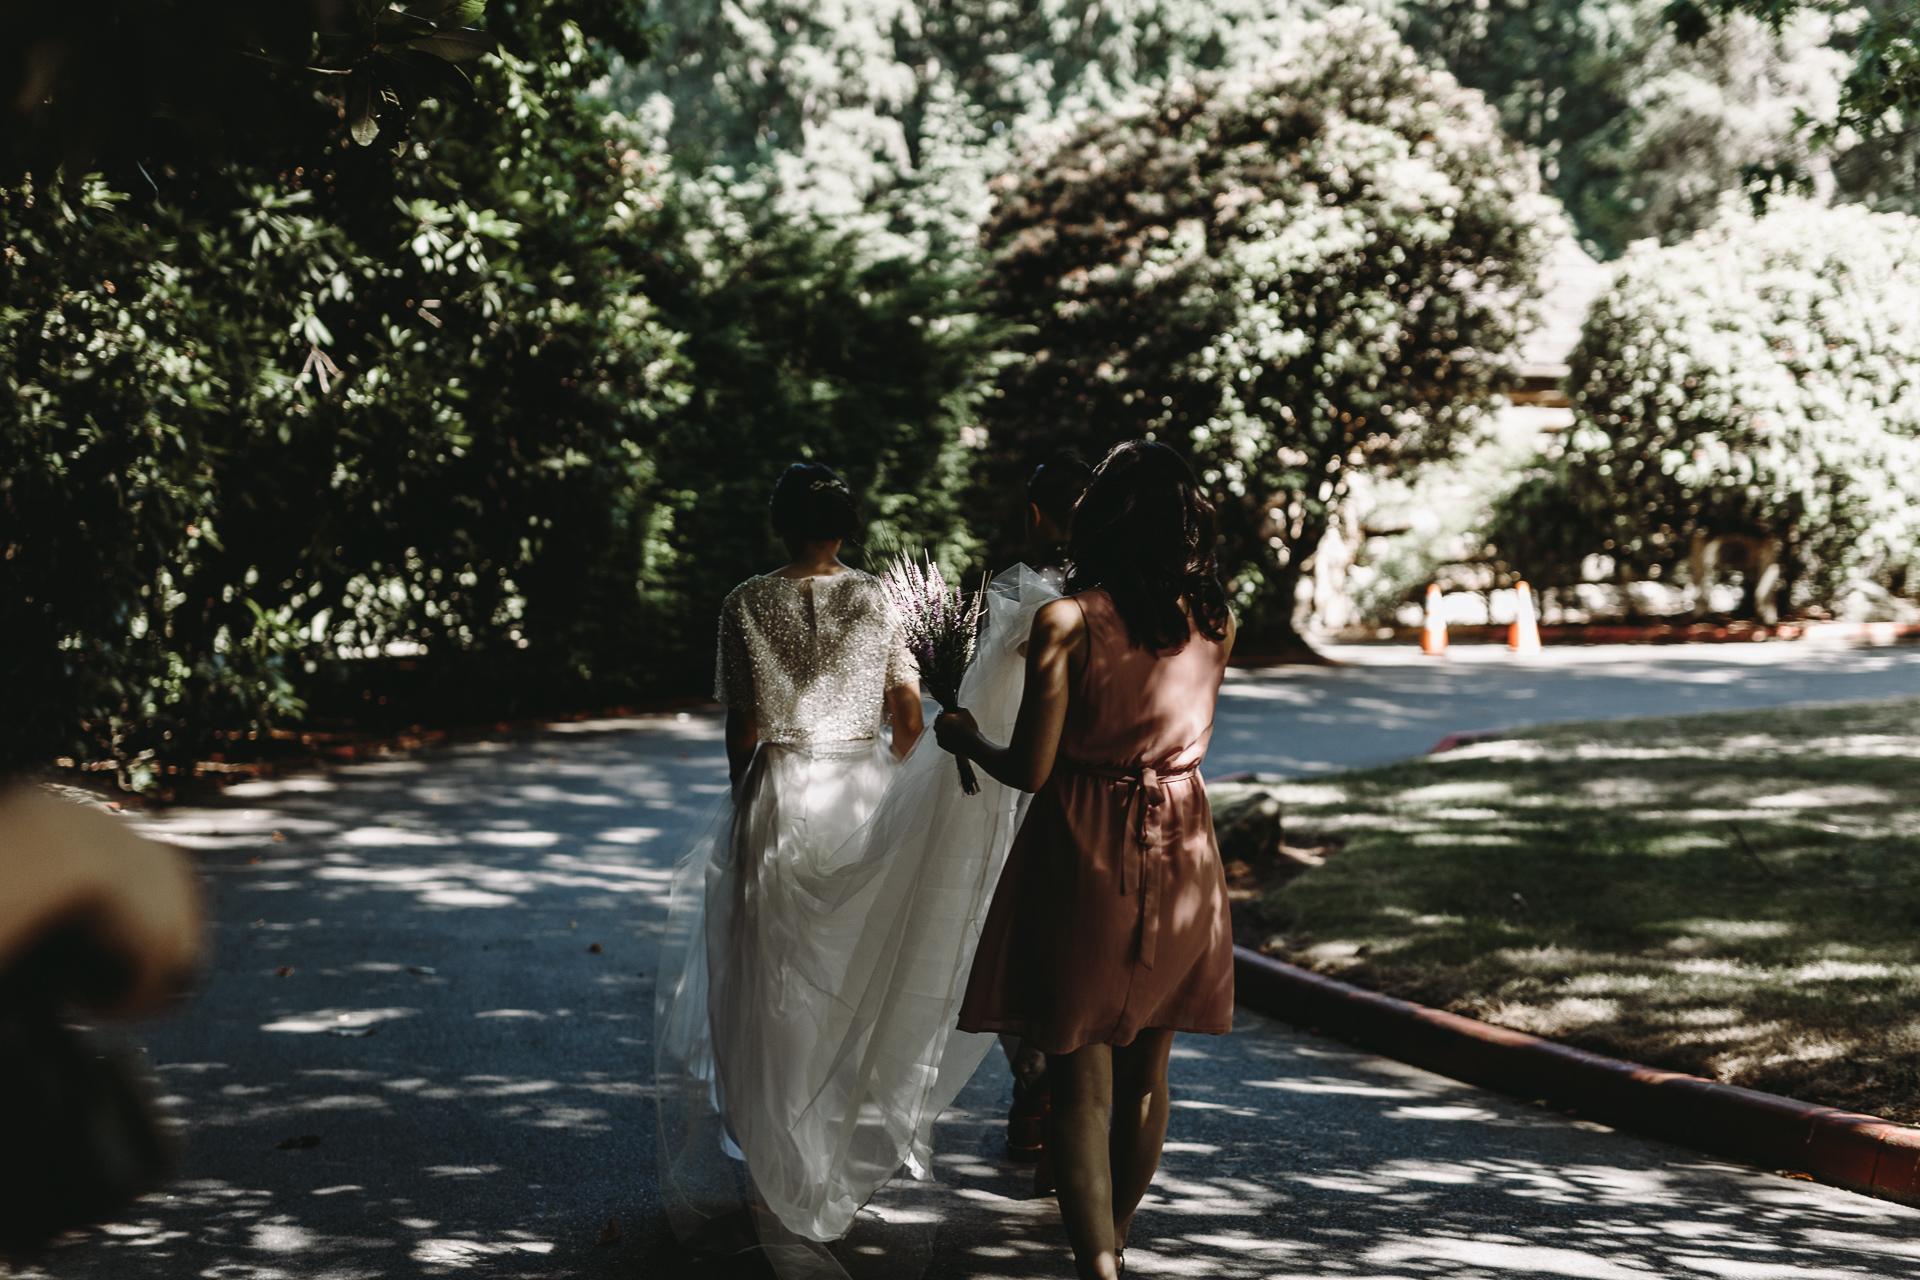 jess-hunter-seattle-artistic-wedding-photographer-4117.jpg